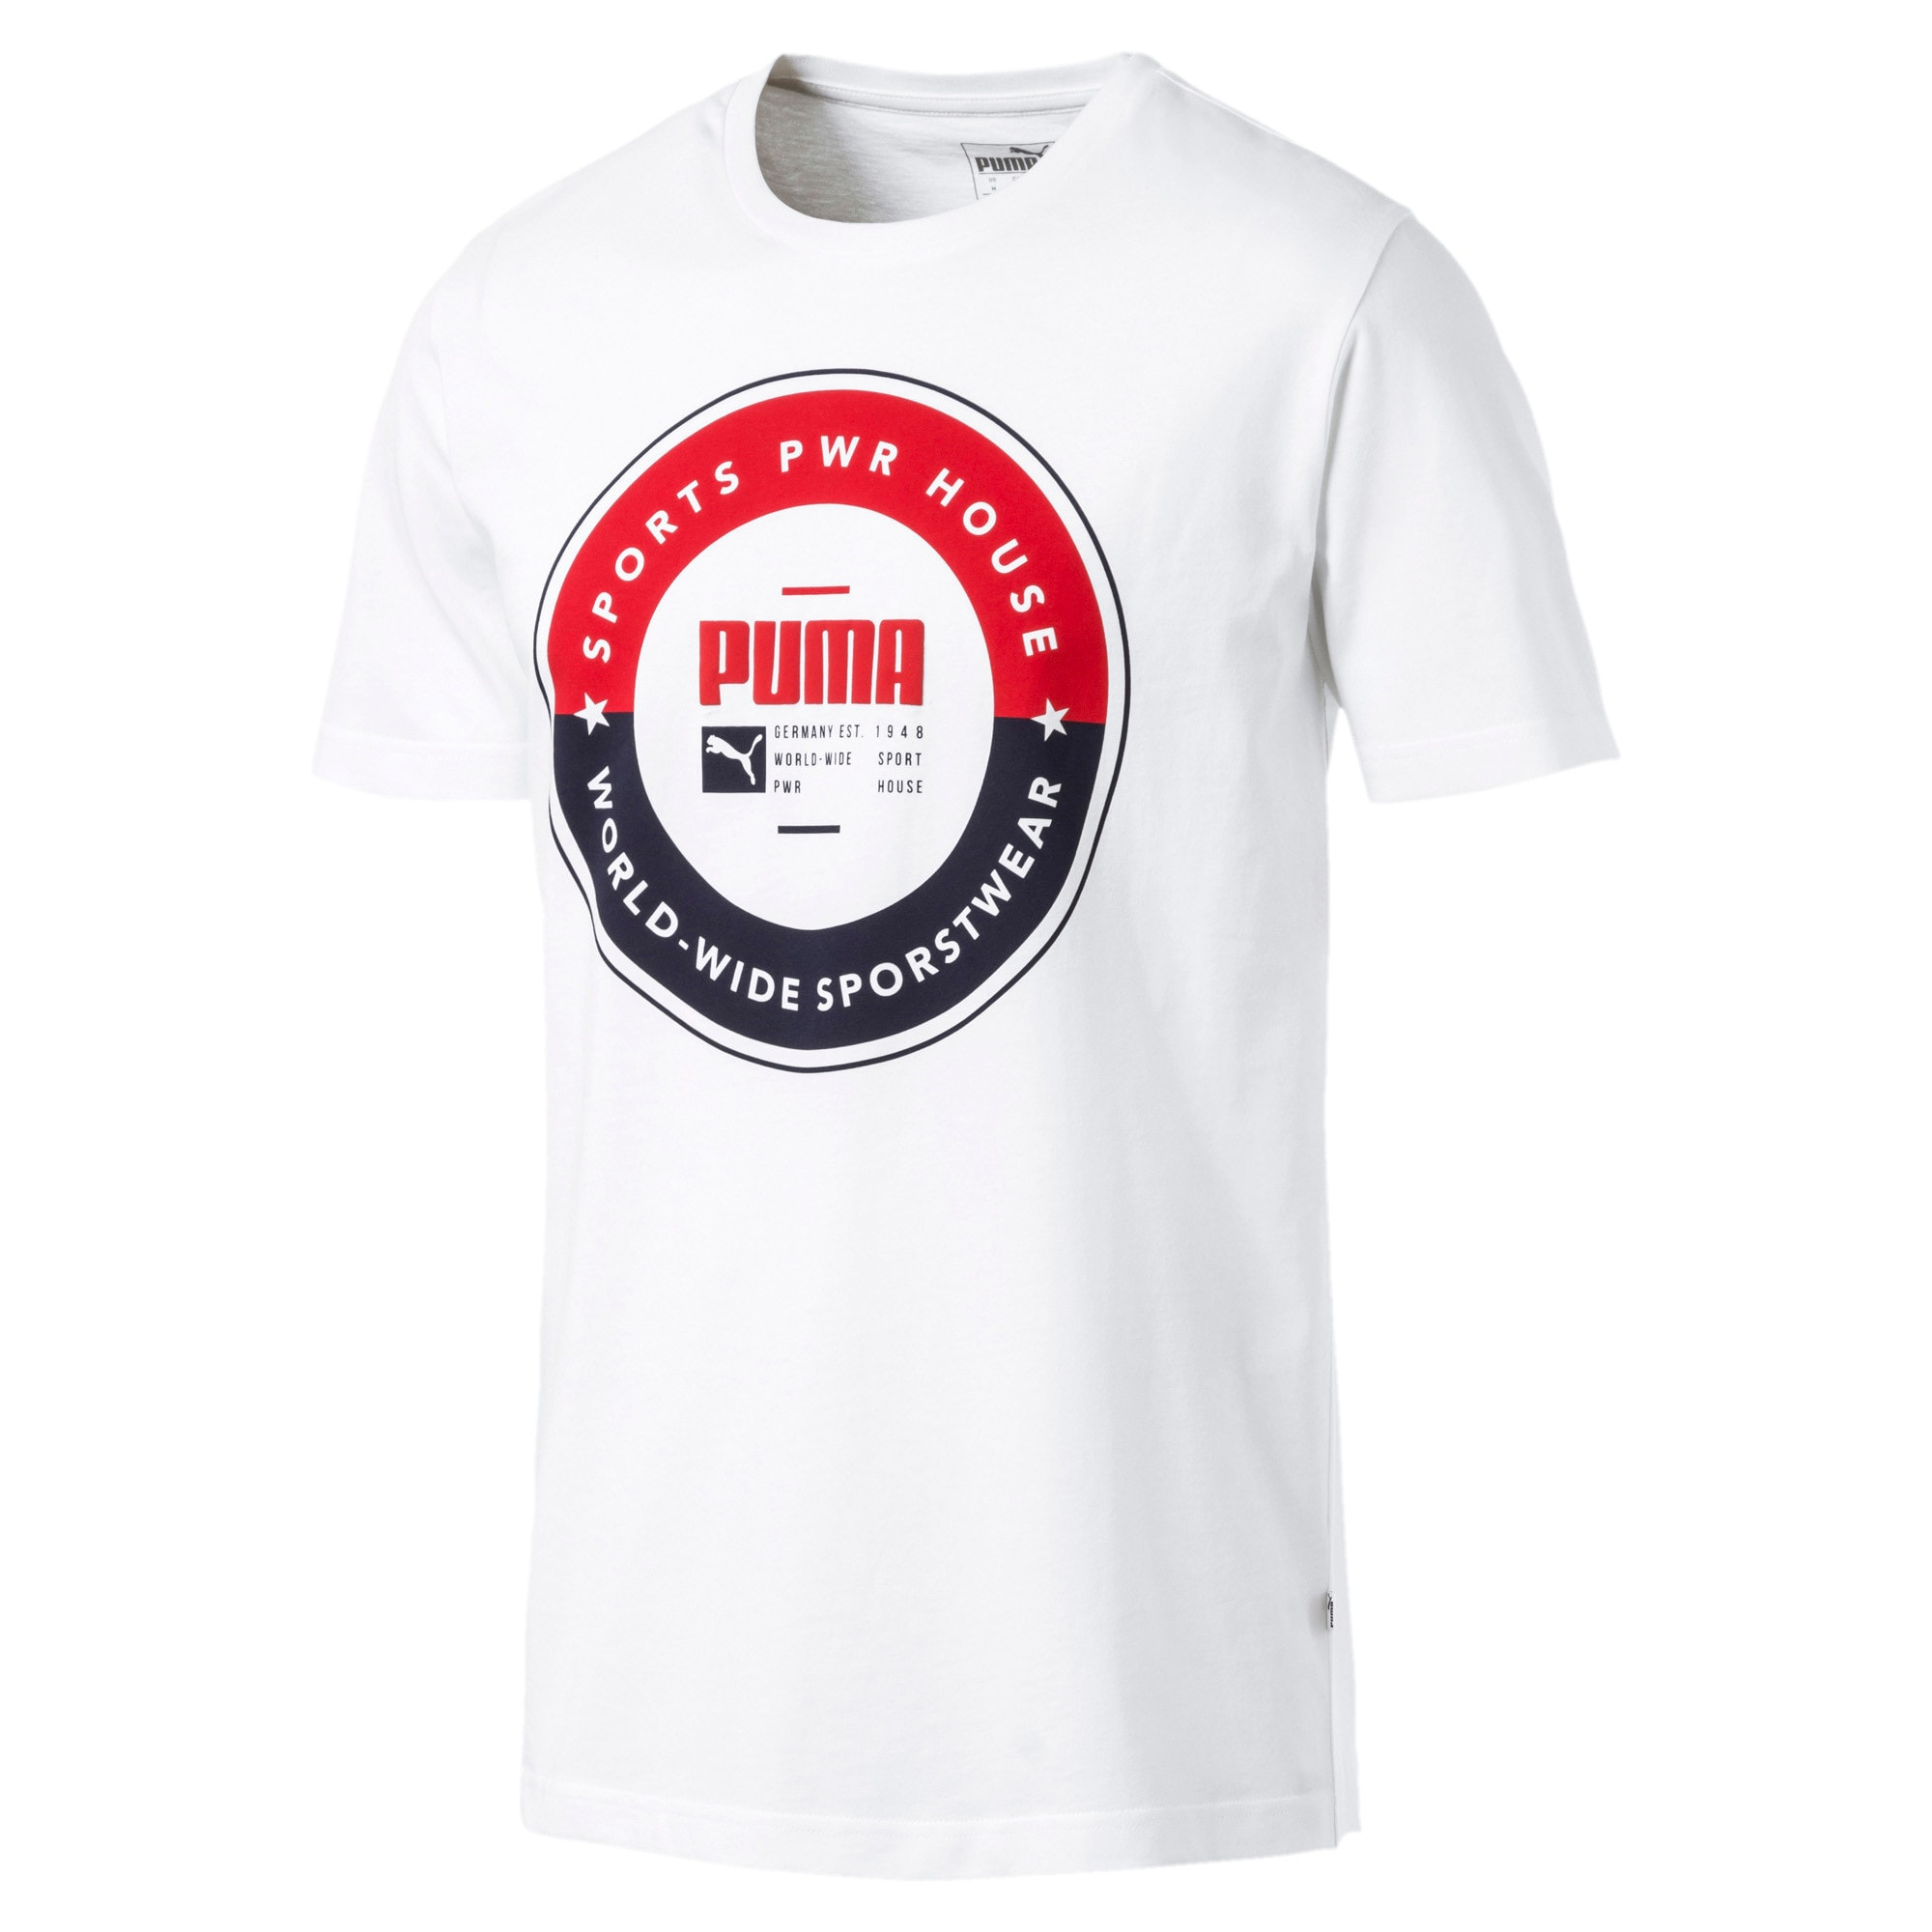 Thumbnail 1 of PUMA SP Execution Tee, Puma White, medium